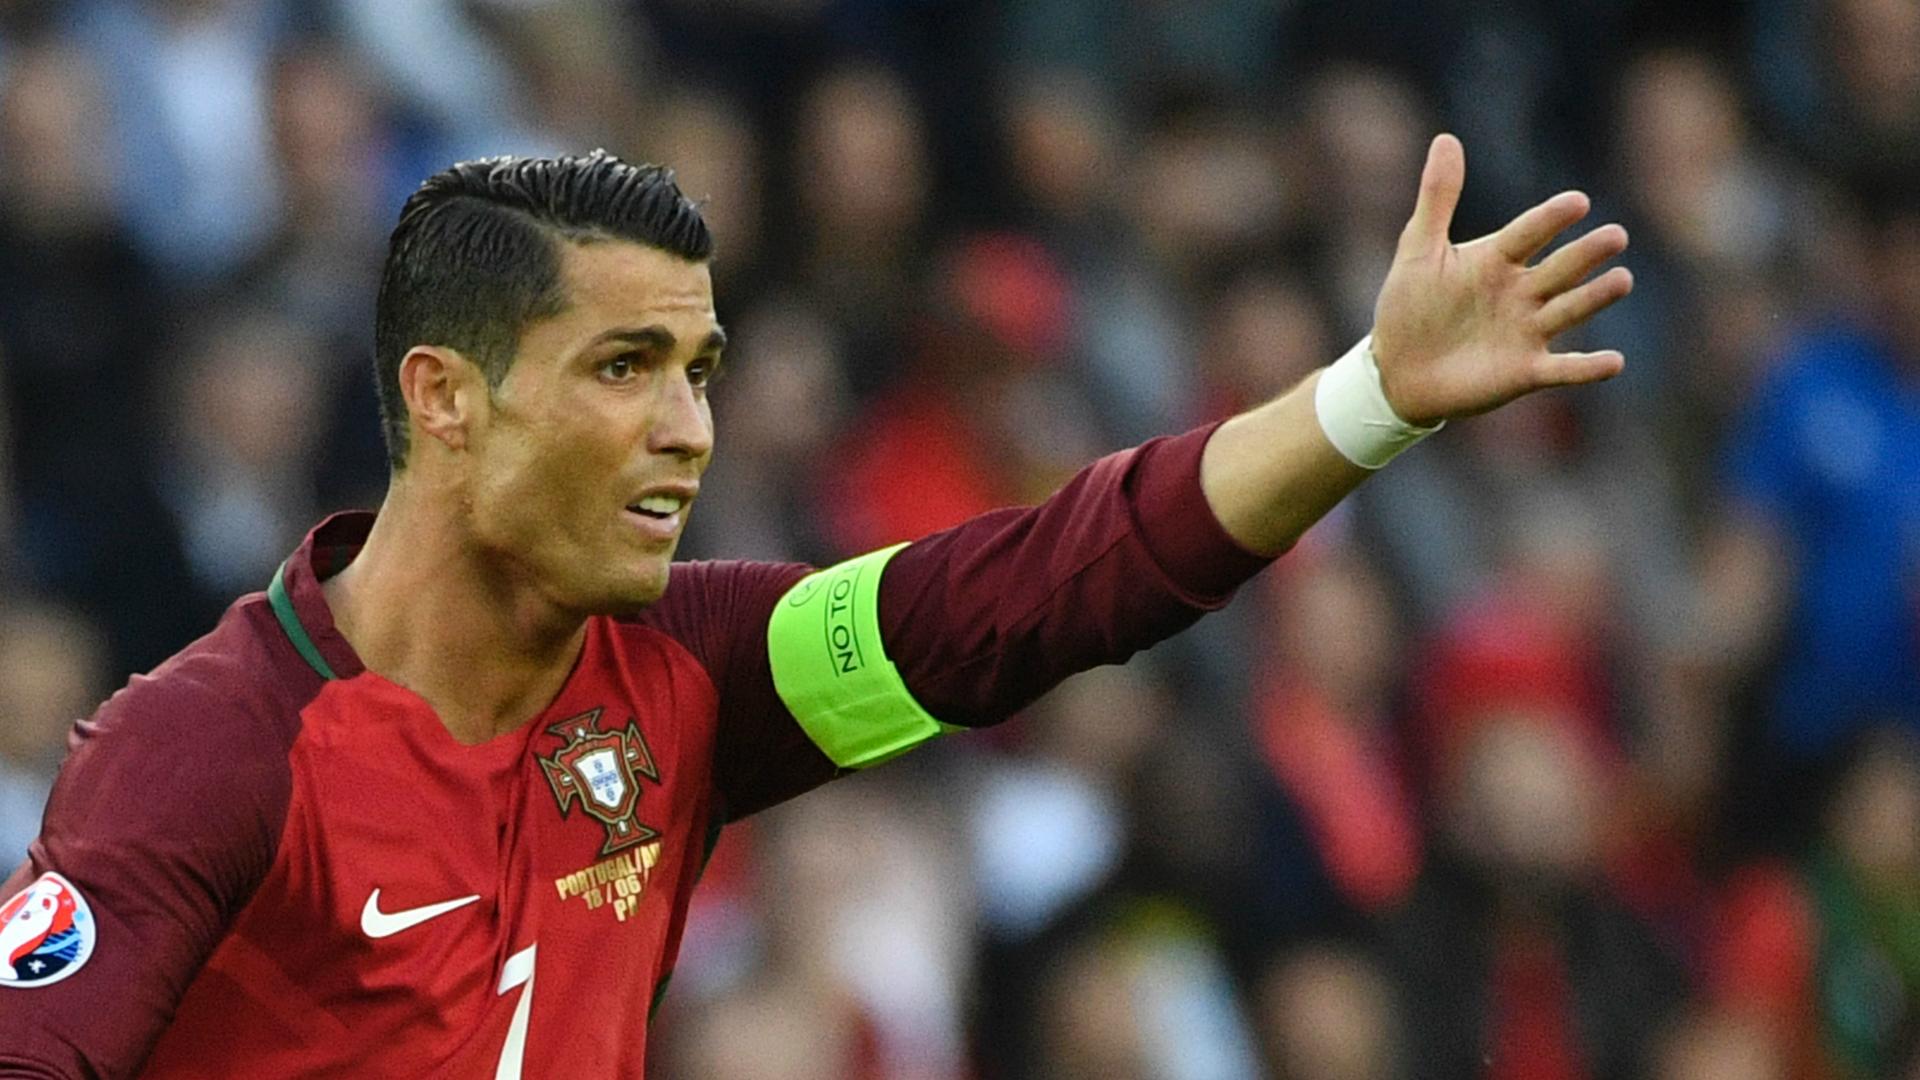 Portugal v Austria Match Report, 18/06/2016, European Championship